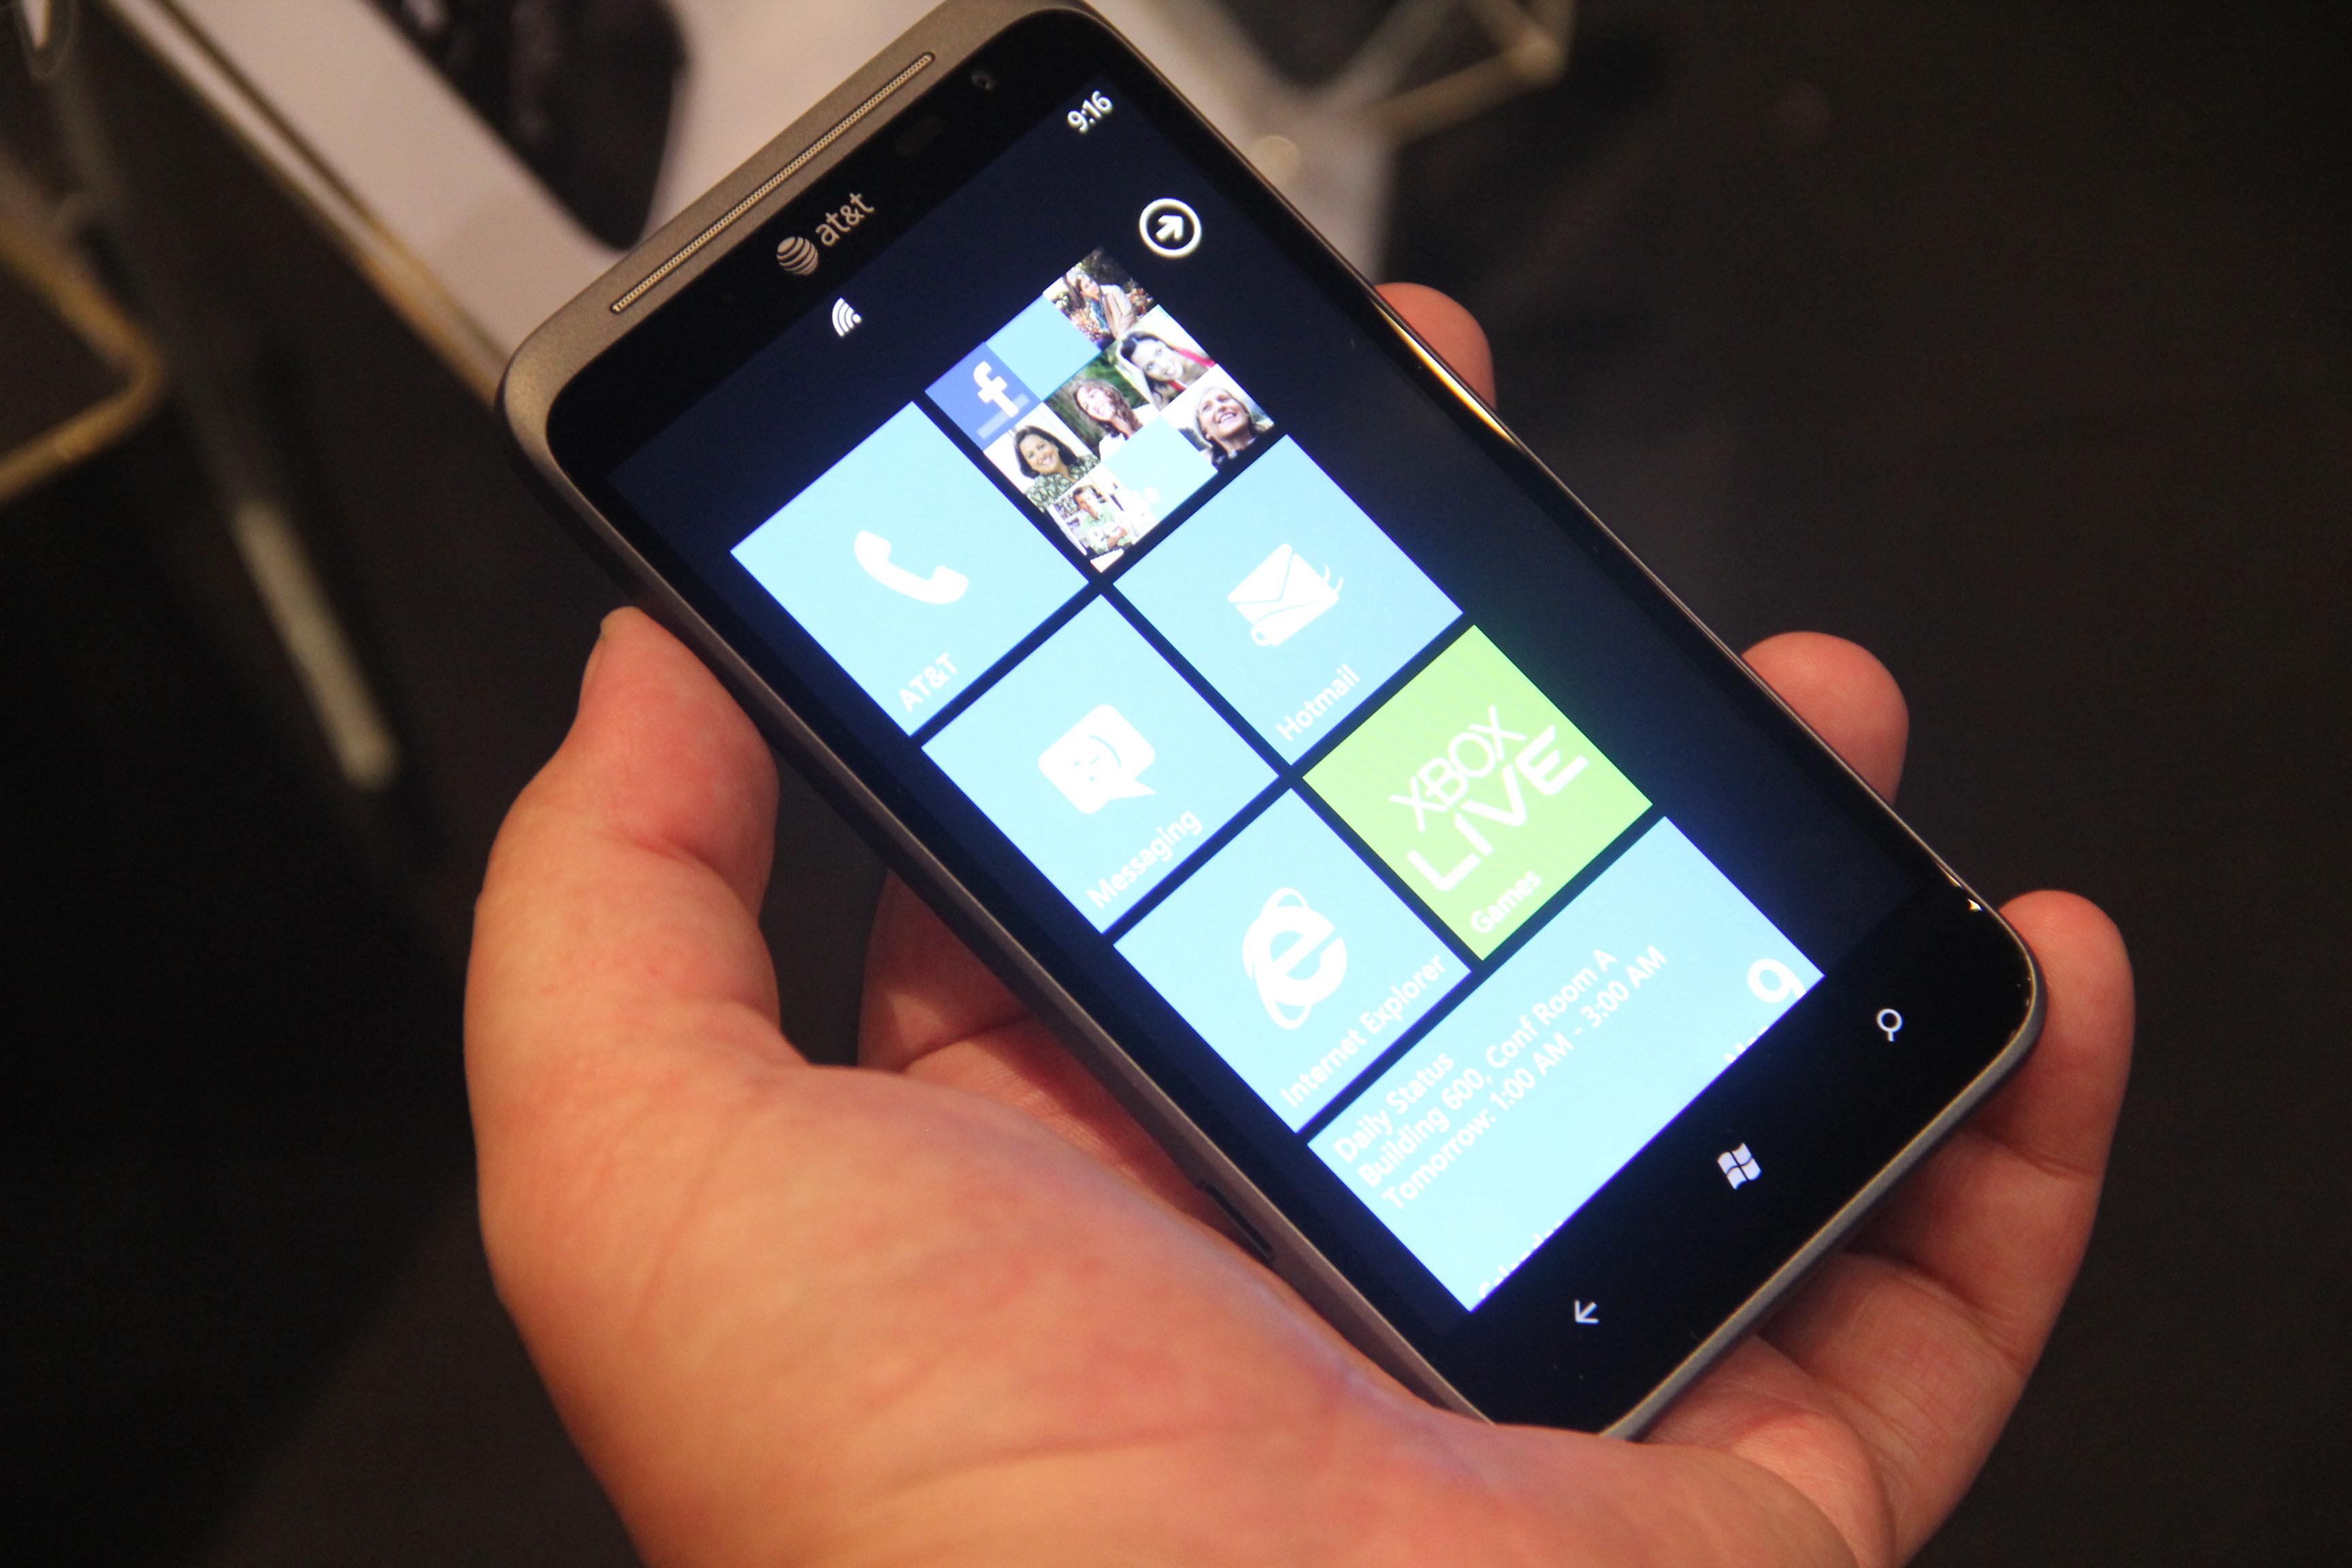 We go hands-on with the 16-megapixel HTC Titan II LTE [Video]